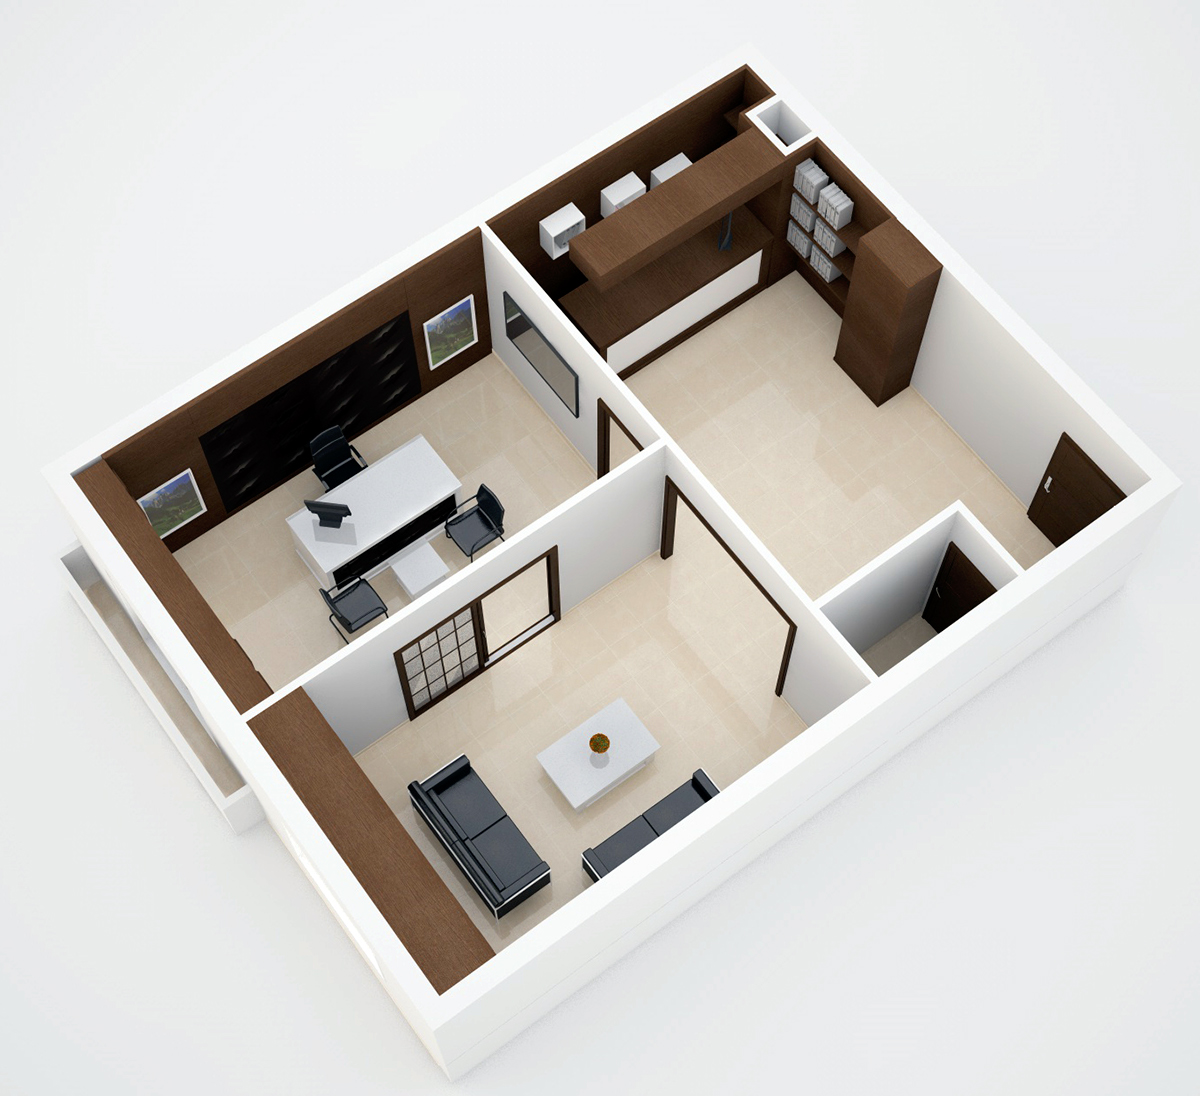 design architecture interior design  Office Design wood design modern style design